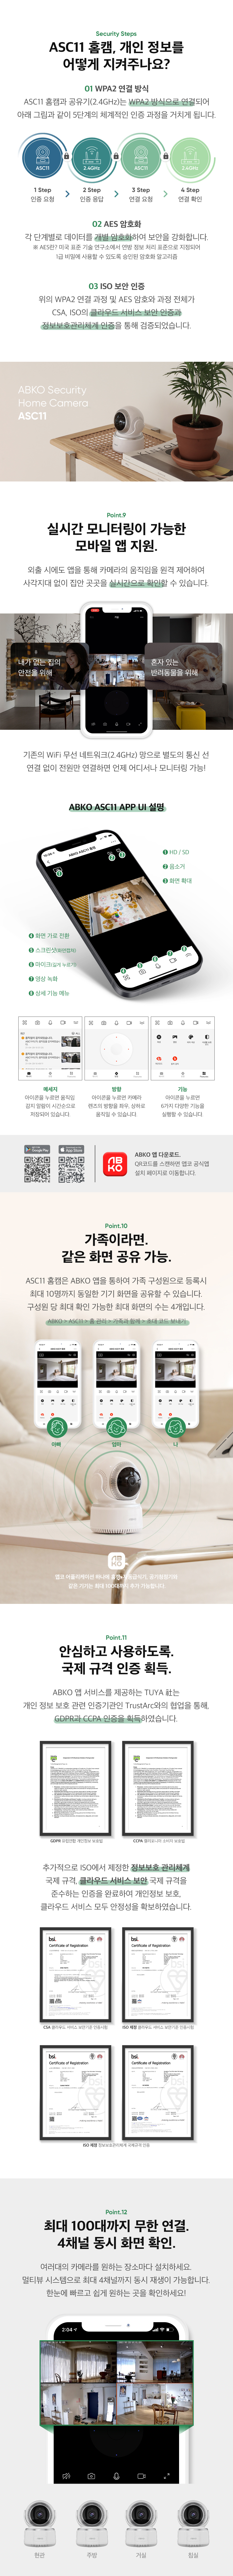 ABKO ASC11 홈캠